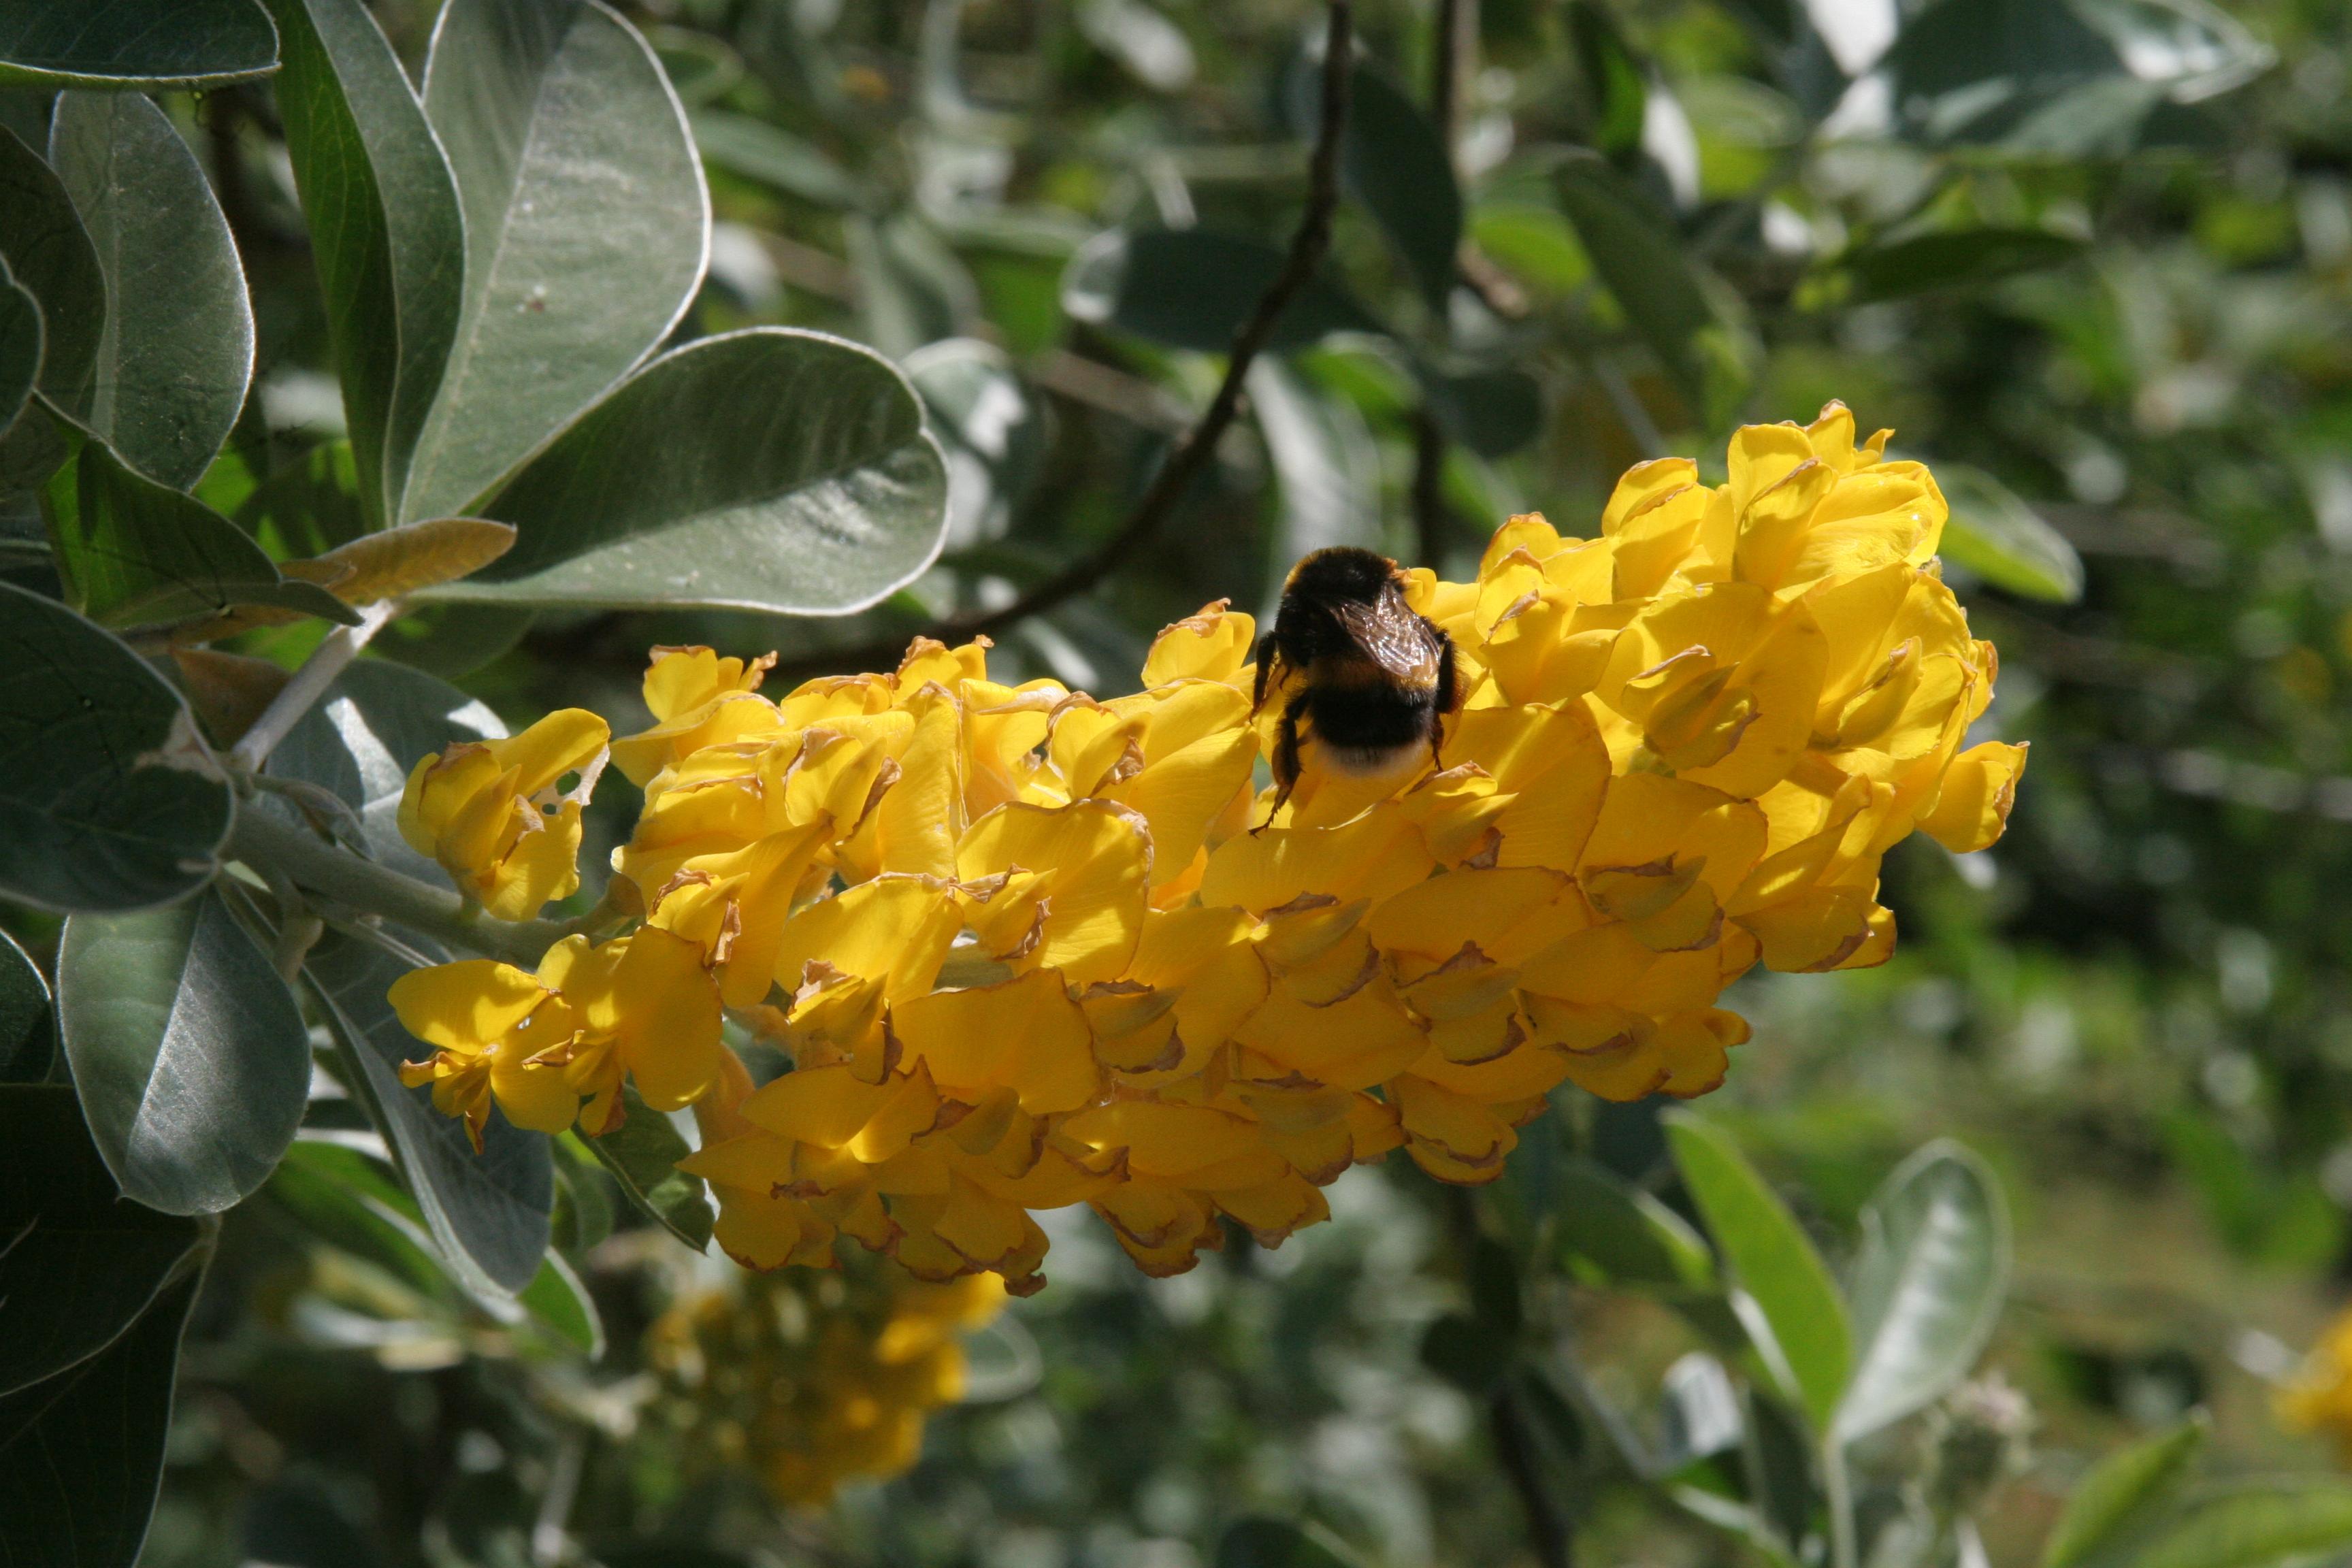 cytisus battandieri1 About